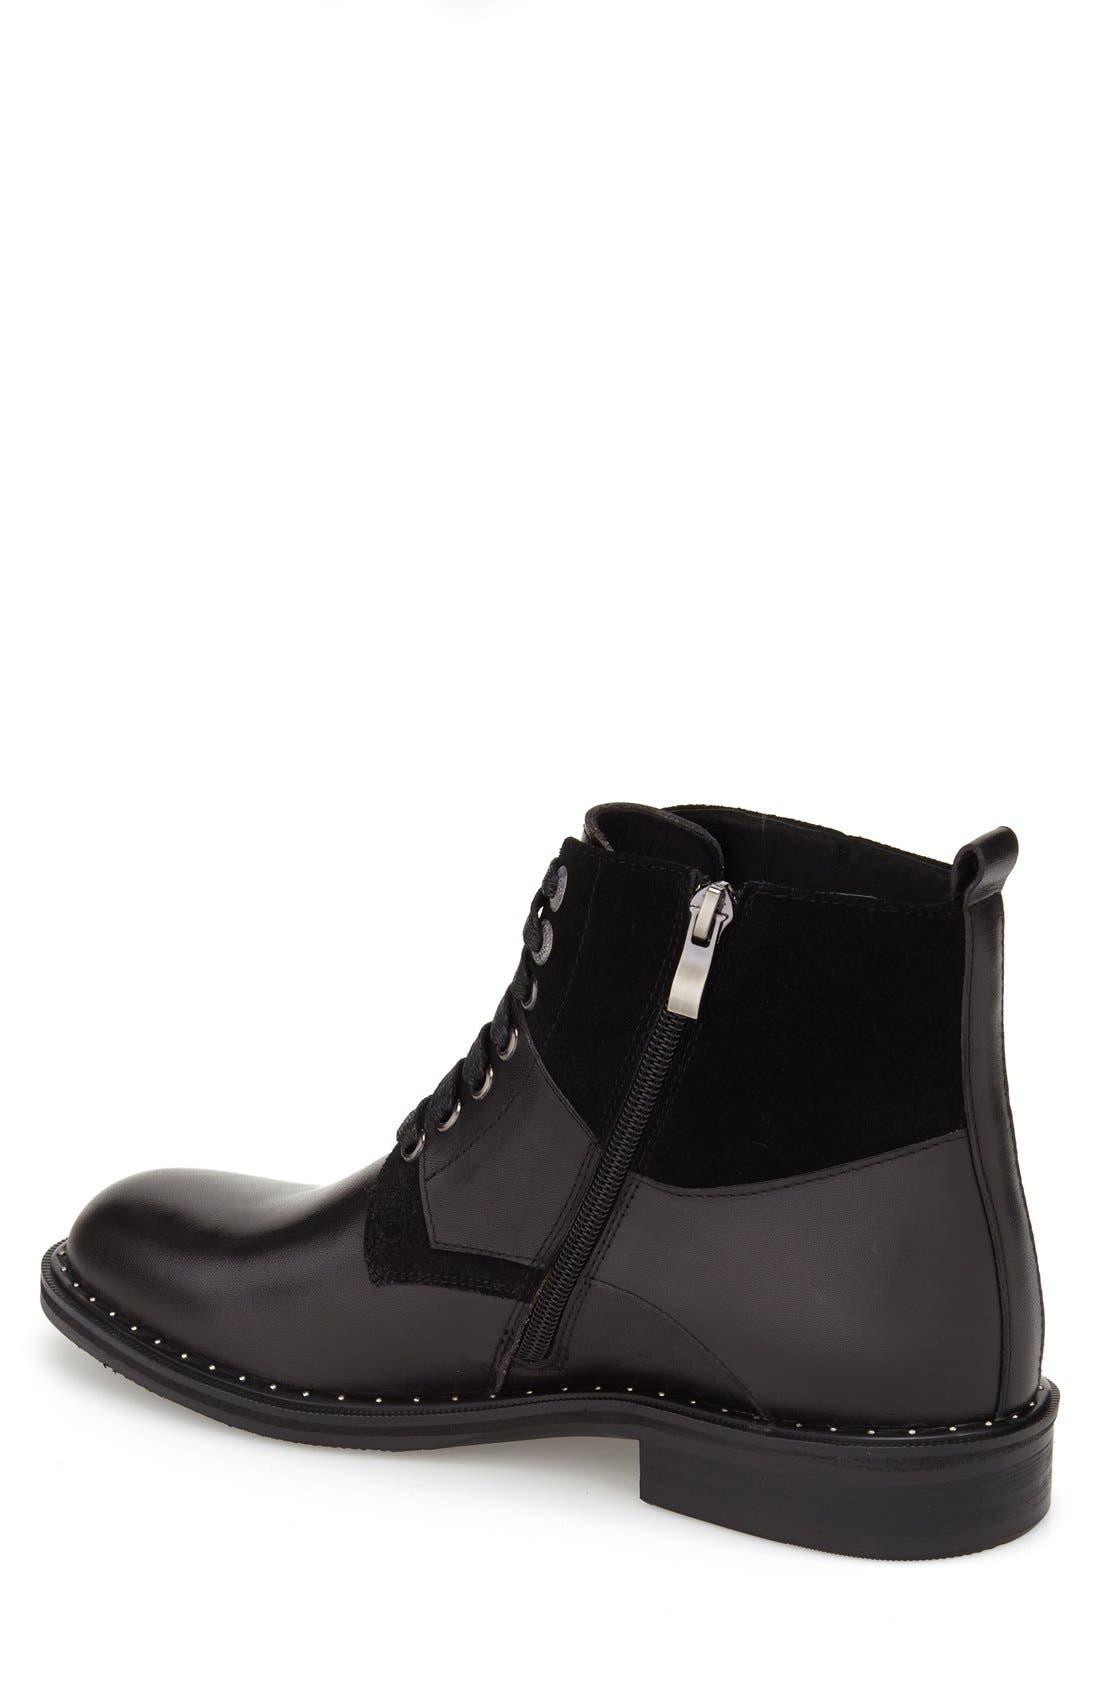 'Verona' Midi Studded Boot,                             Alternate thumbnail 2, color,                             Black